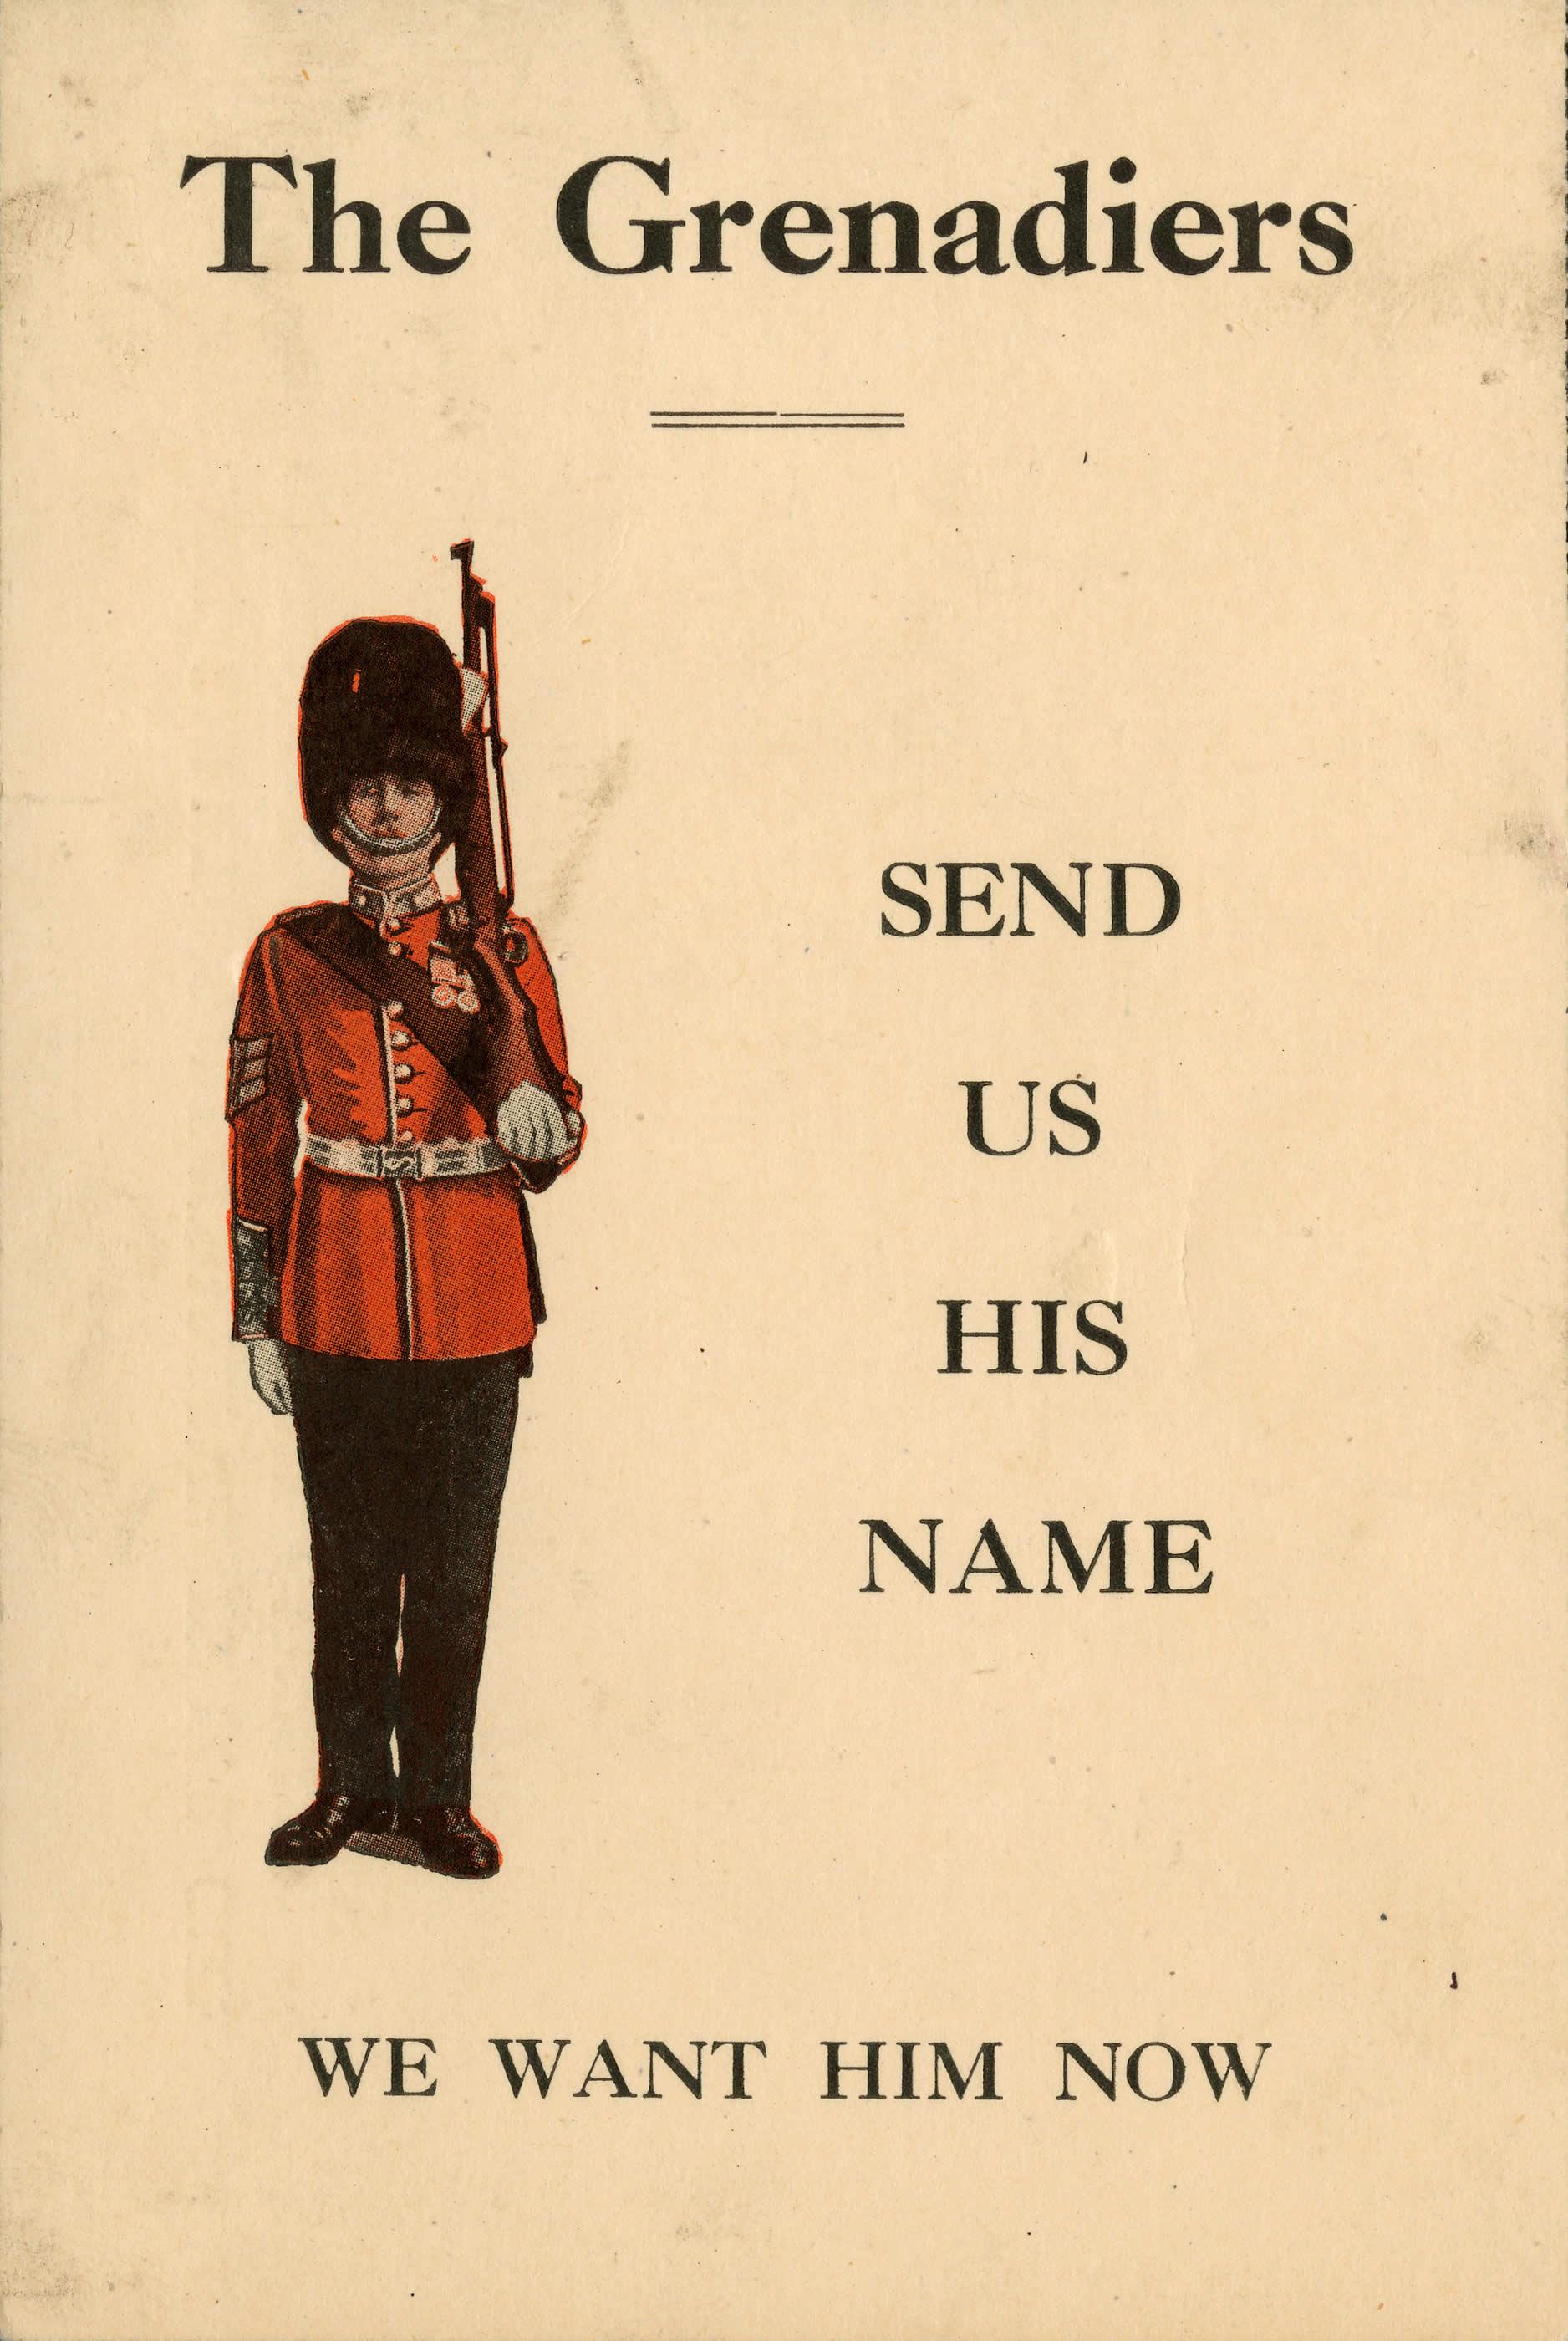 <i>Send Us His Name (Envoyez-nous son nom)</i>